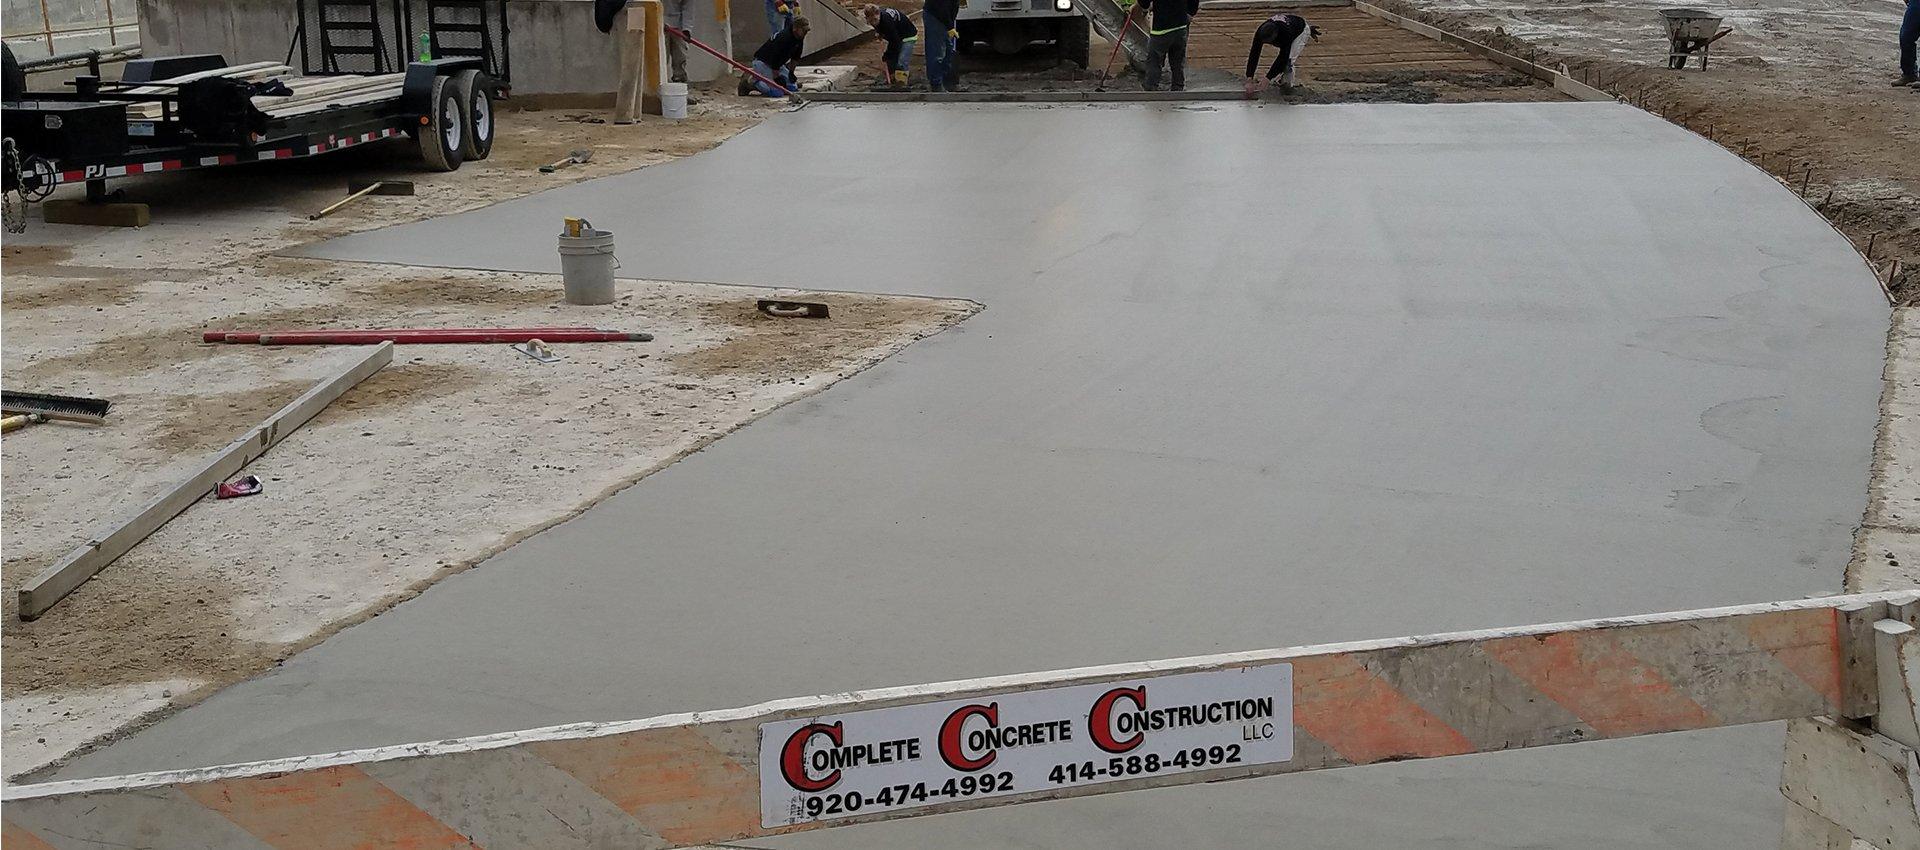 complete_concrete-construction-wisconsin-slider8